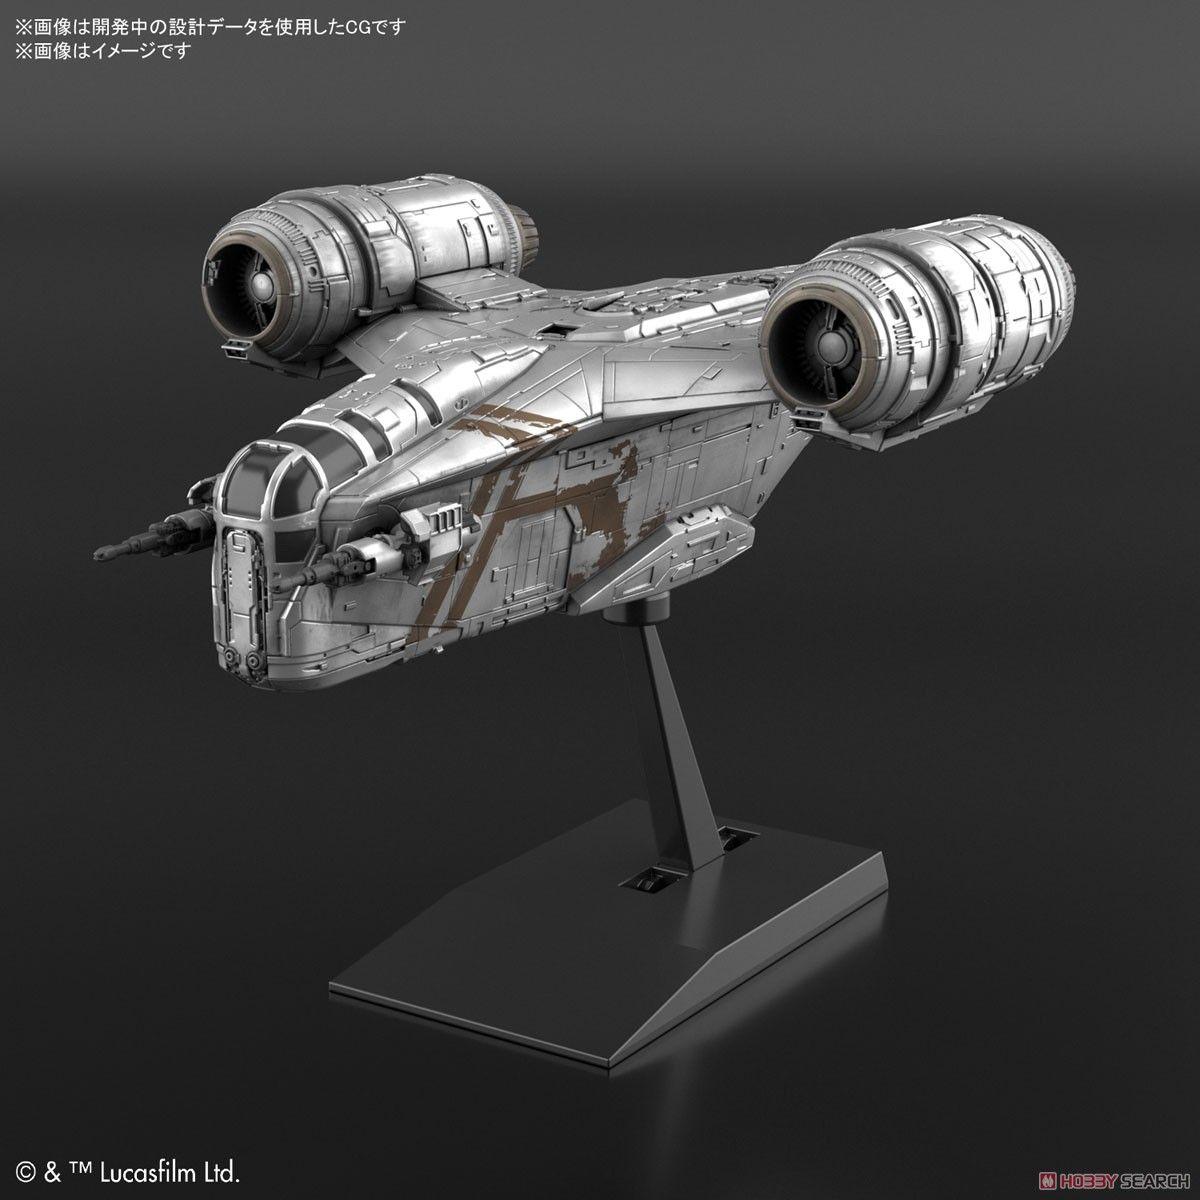 Bandai 5061795 Vehicle Model EX018 Razor Crest Silver Coating Ver.